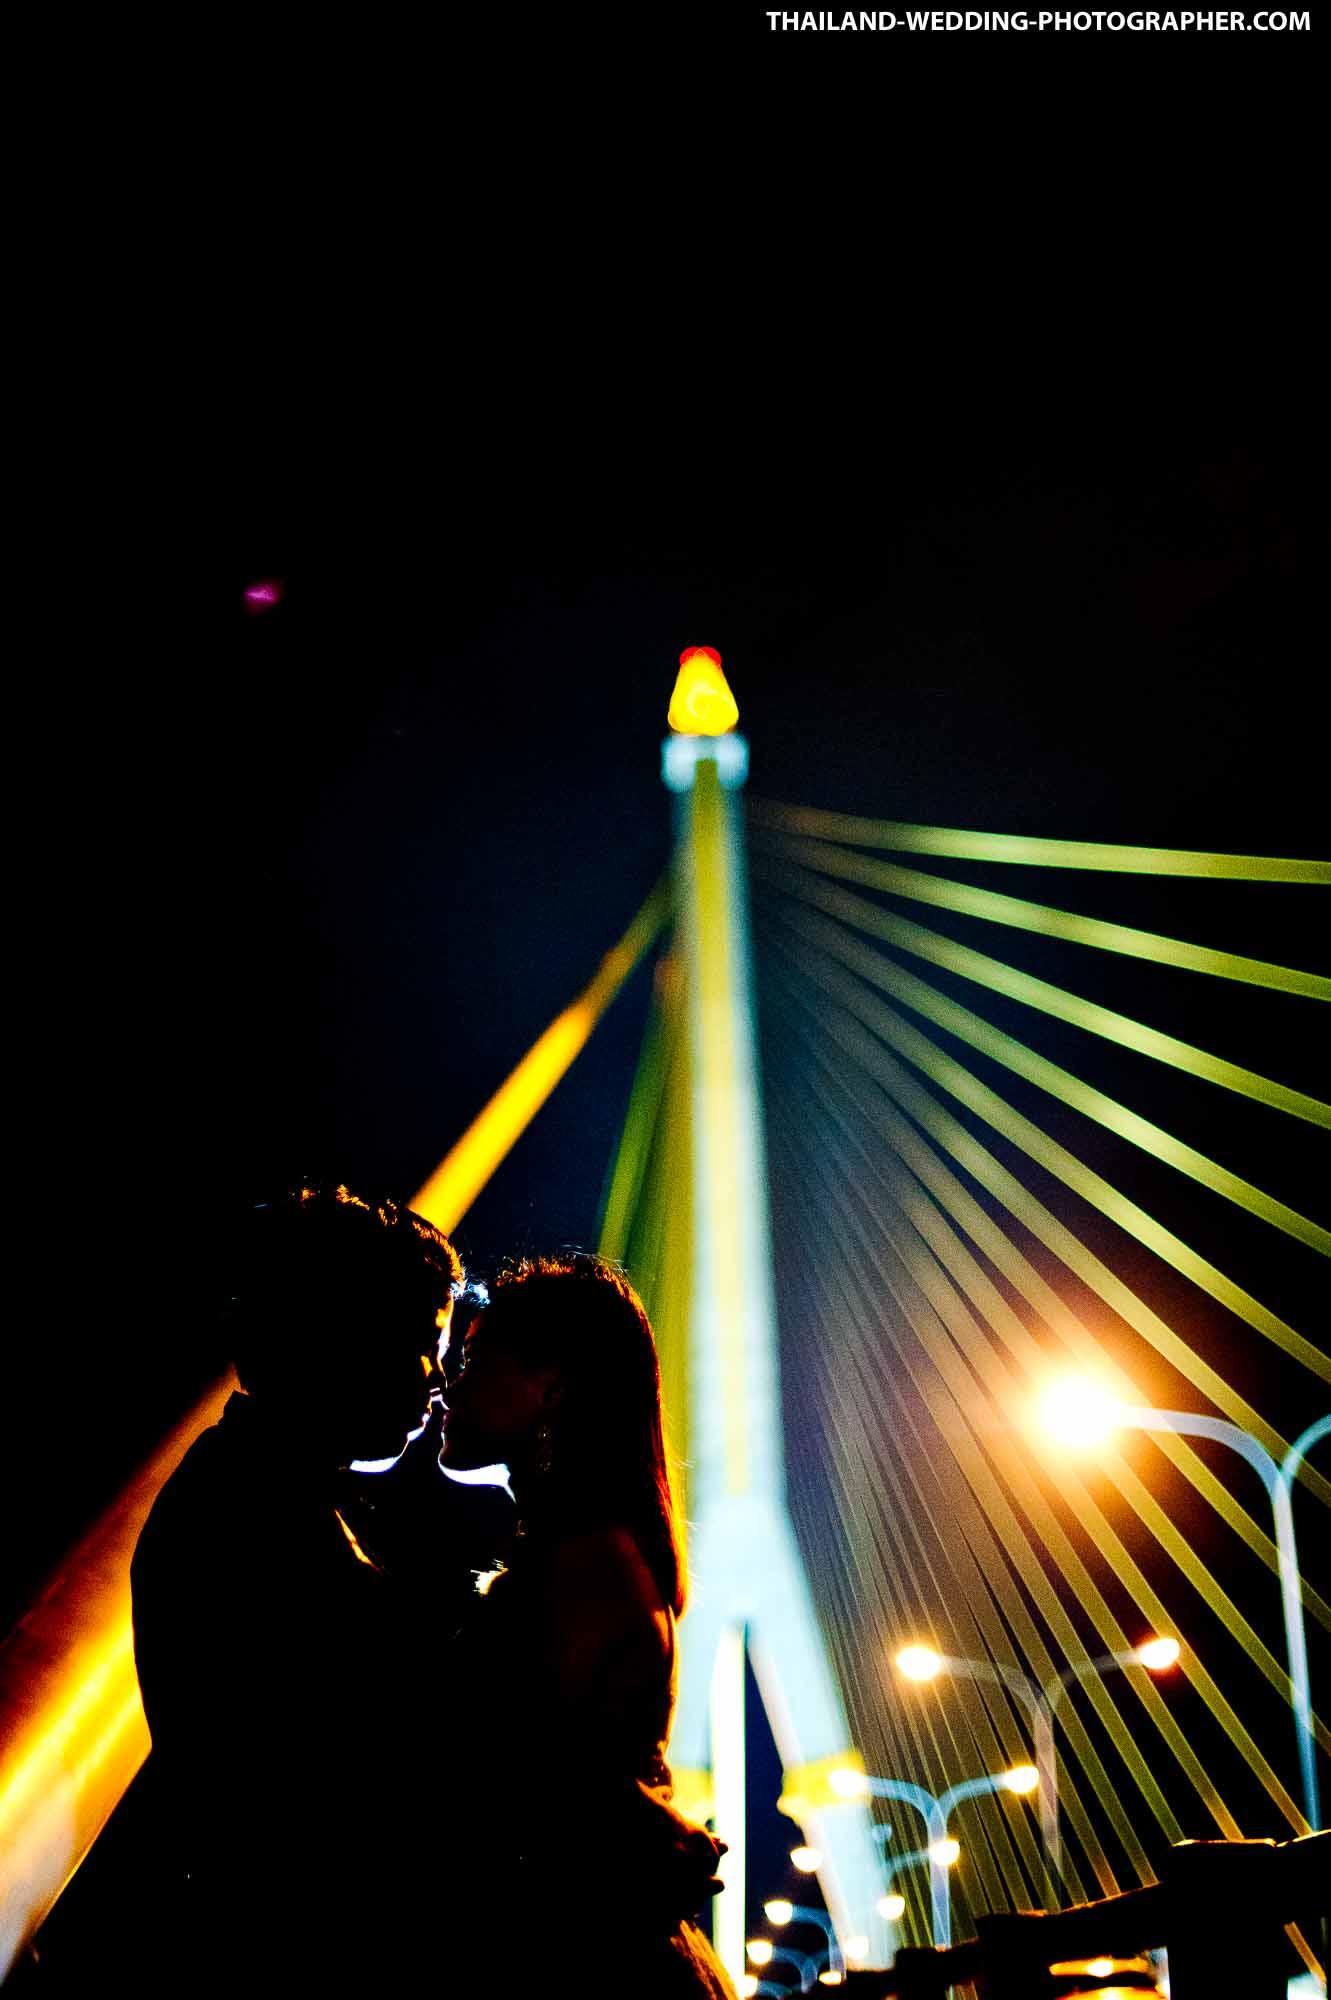 Thailand Bangkok Rama VIII Suspension Bridge Wedding Photography   NET-Photography Thailand Wedding Photographer